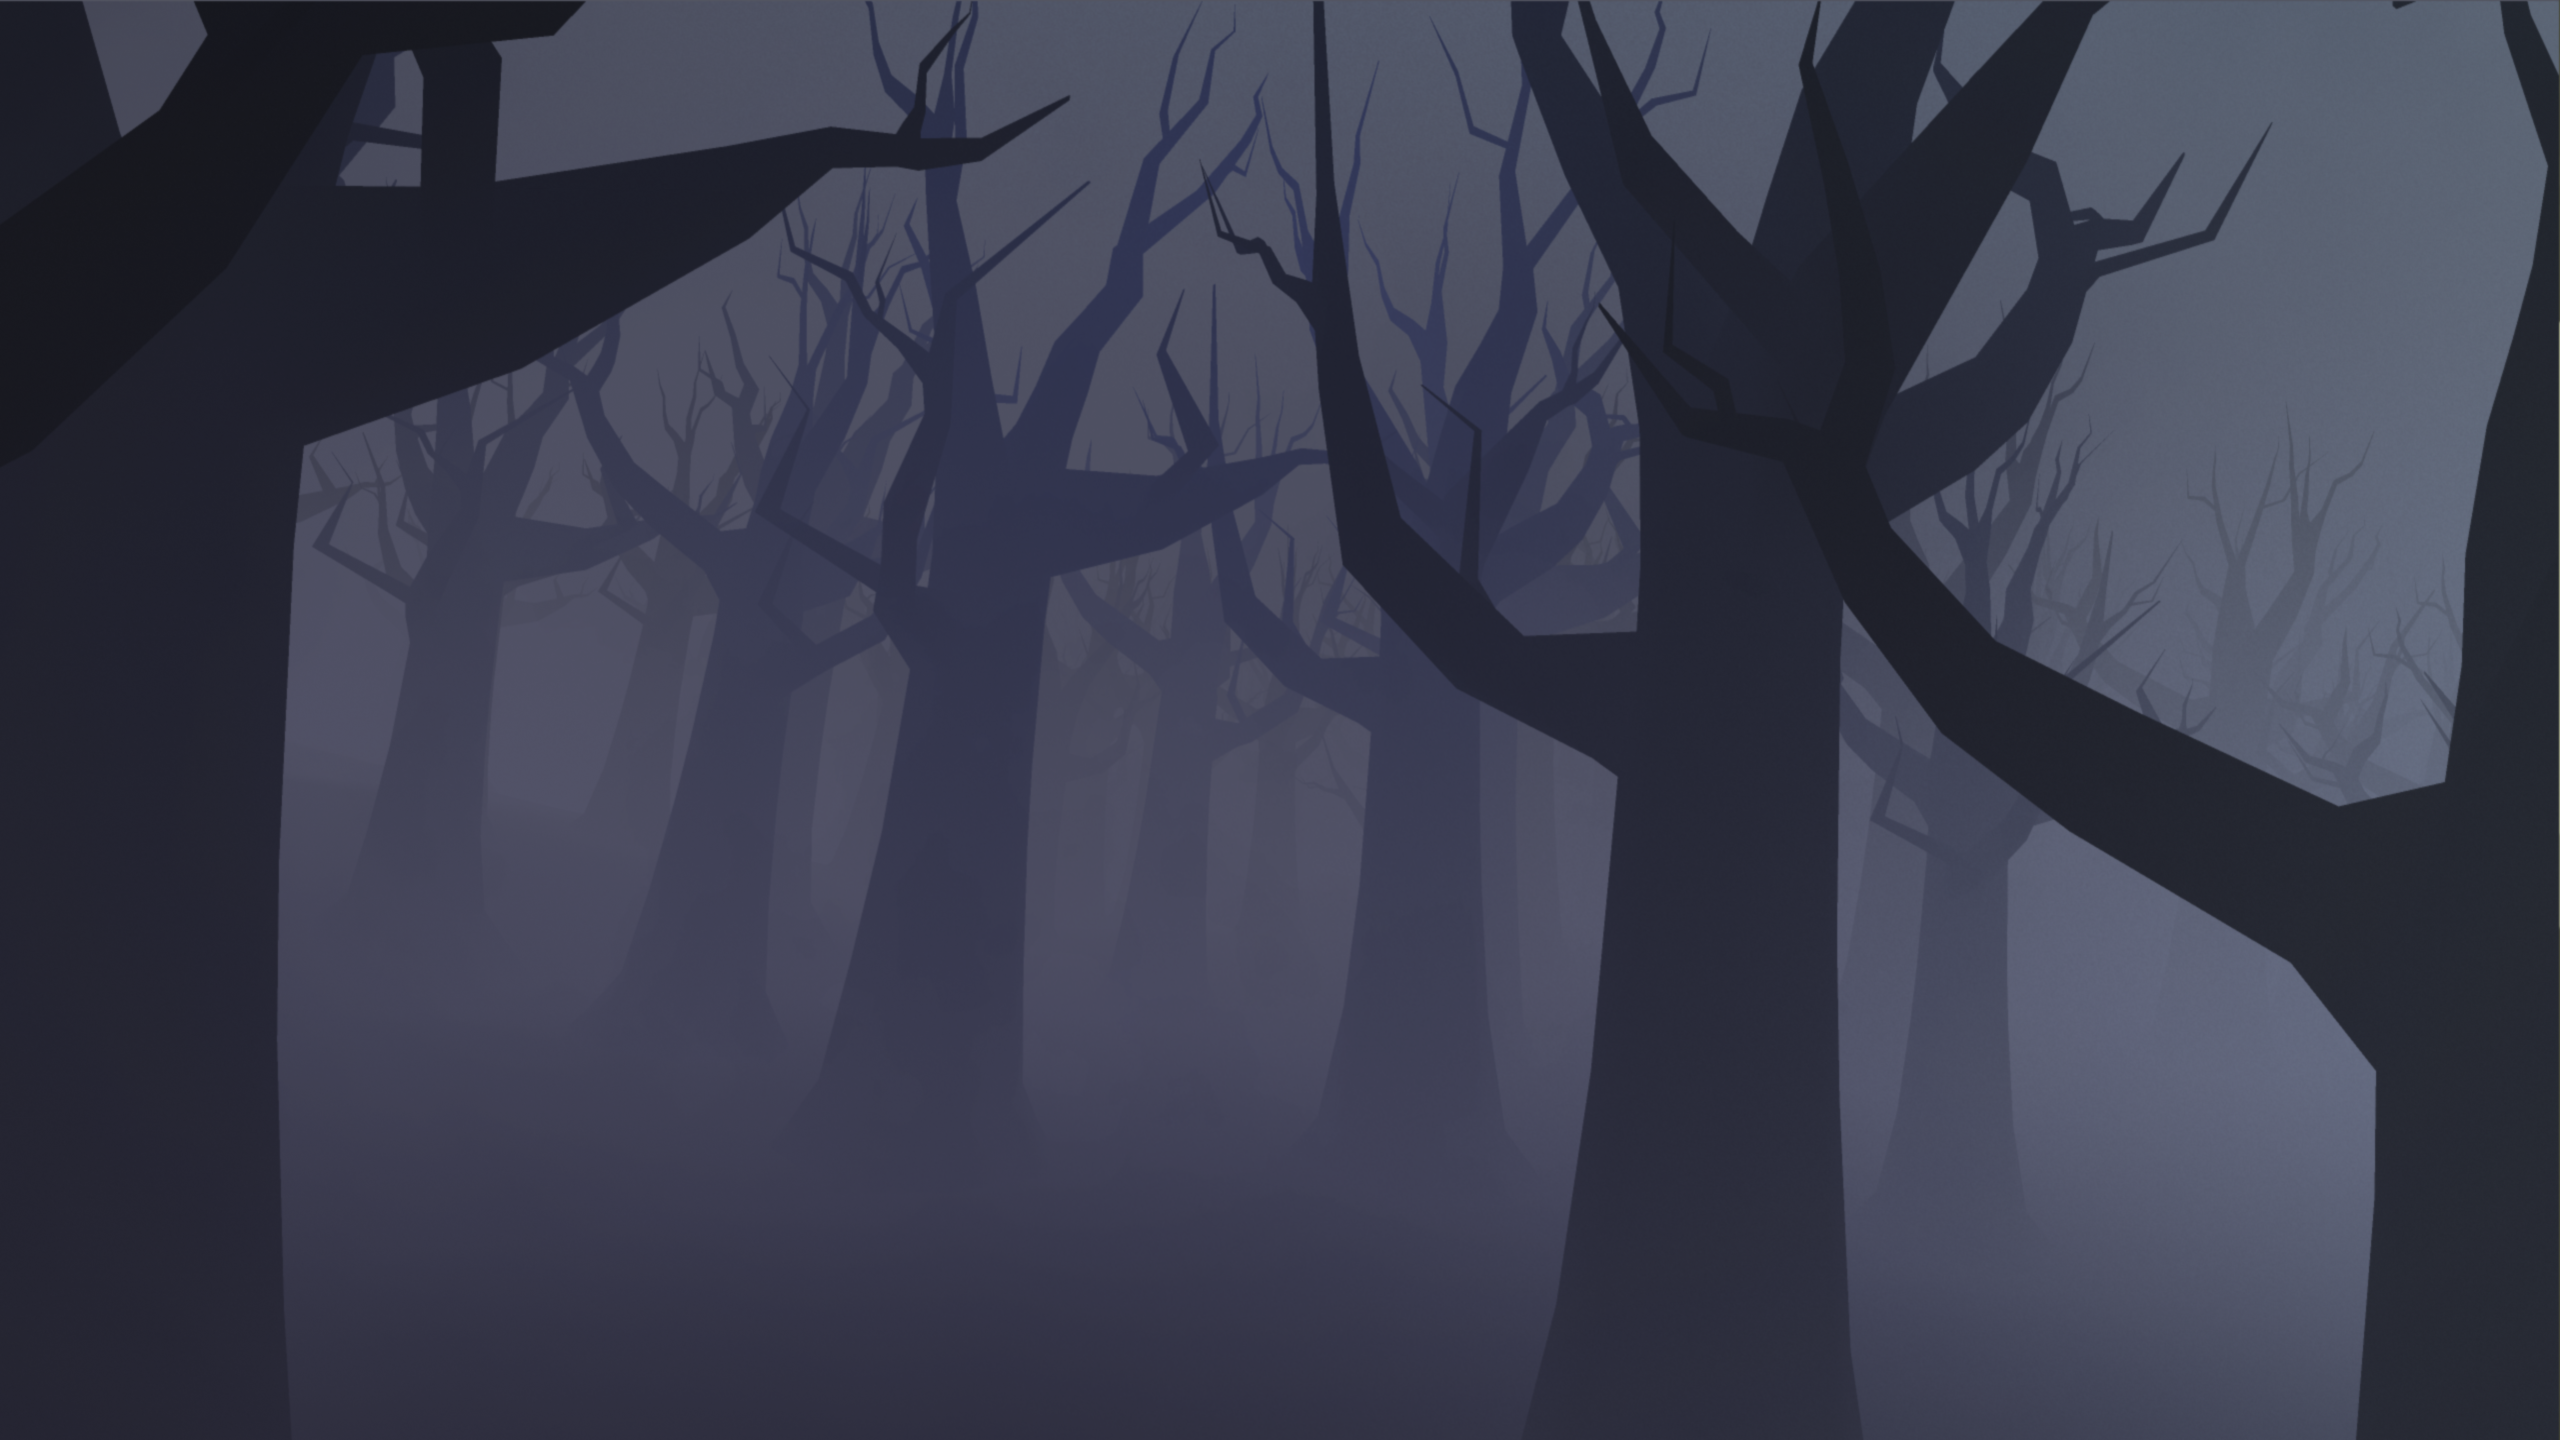 Good Wallpaper Harry Potter Purple - 16096  You Should Have_234865.jpg